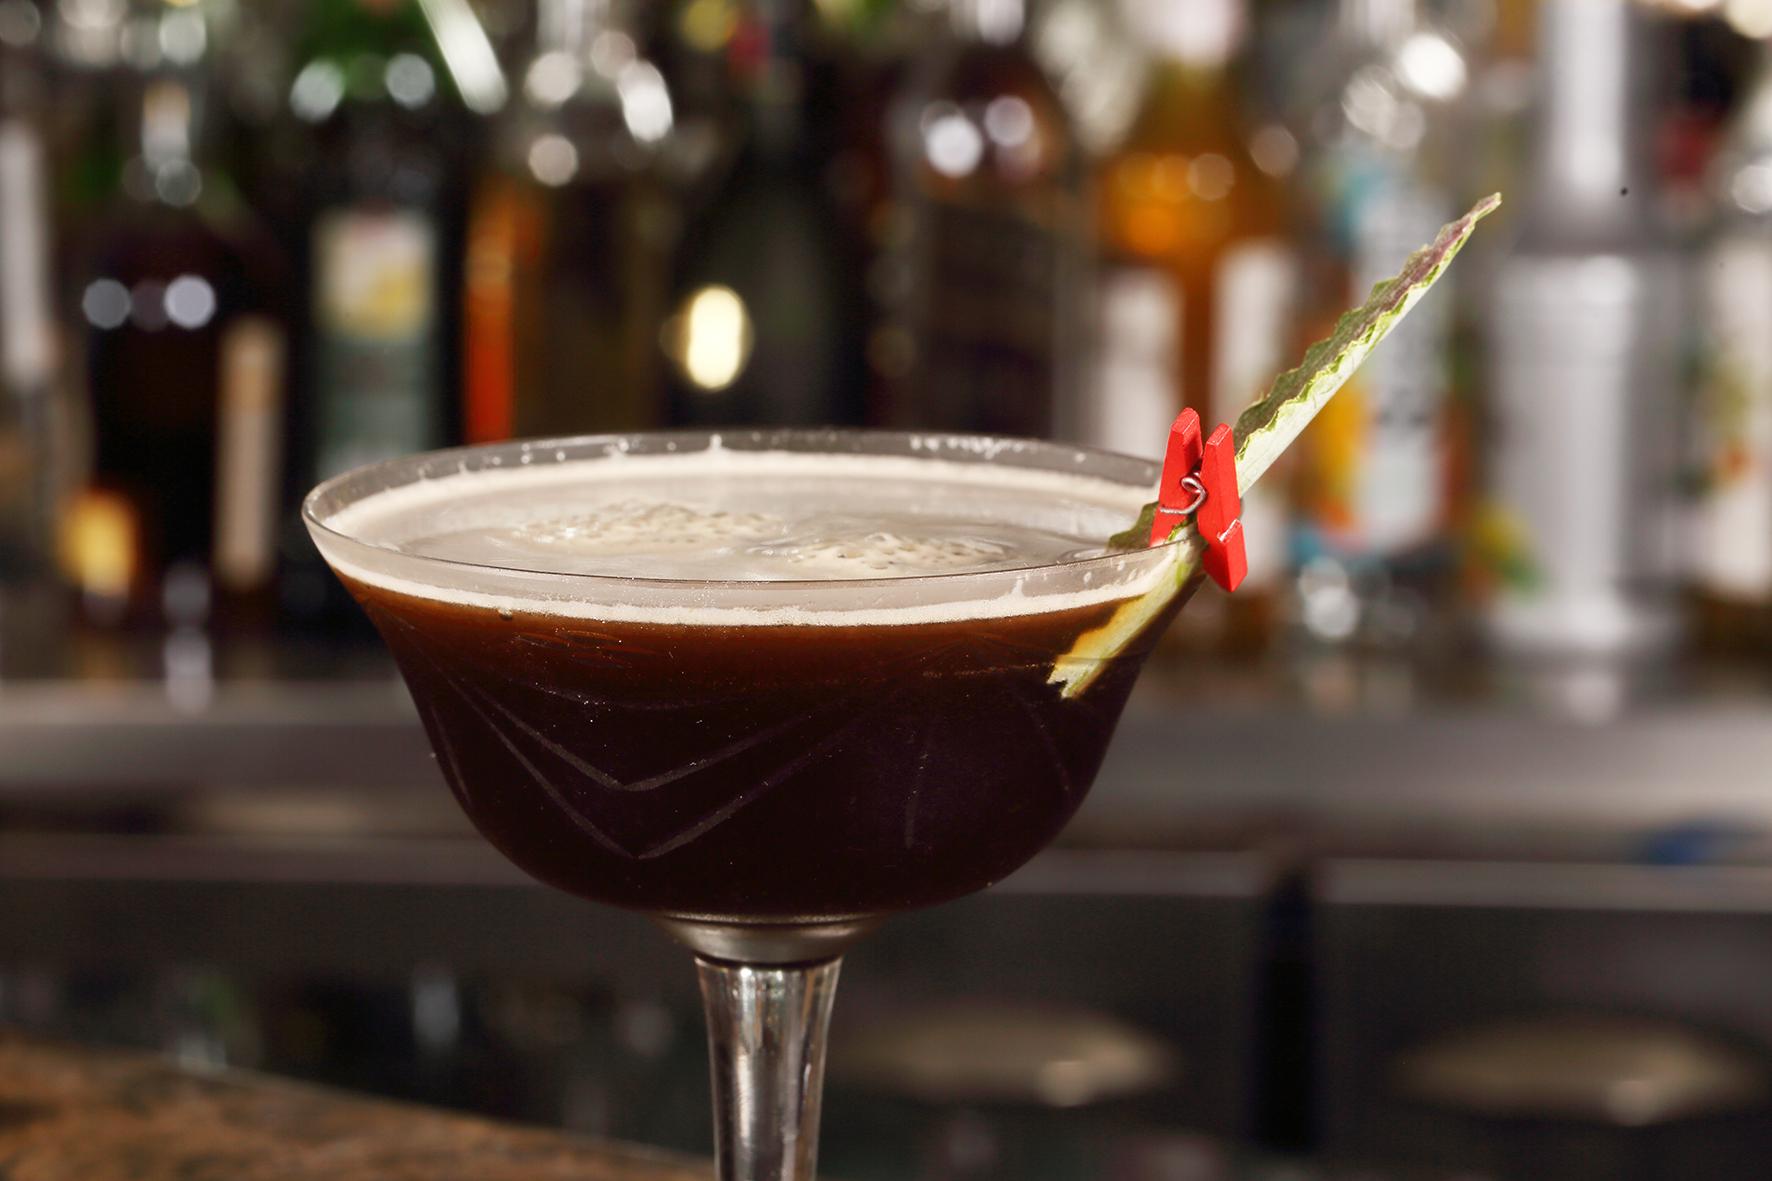 Julieta-Bar_Black-Cofee_credito-Jose-Renato-Antunes-1